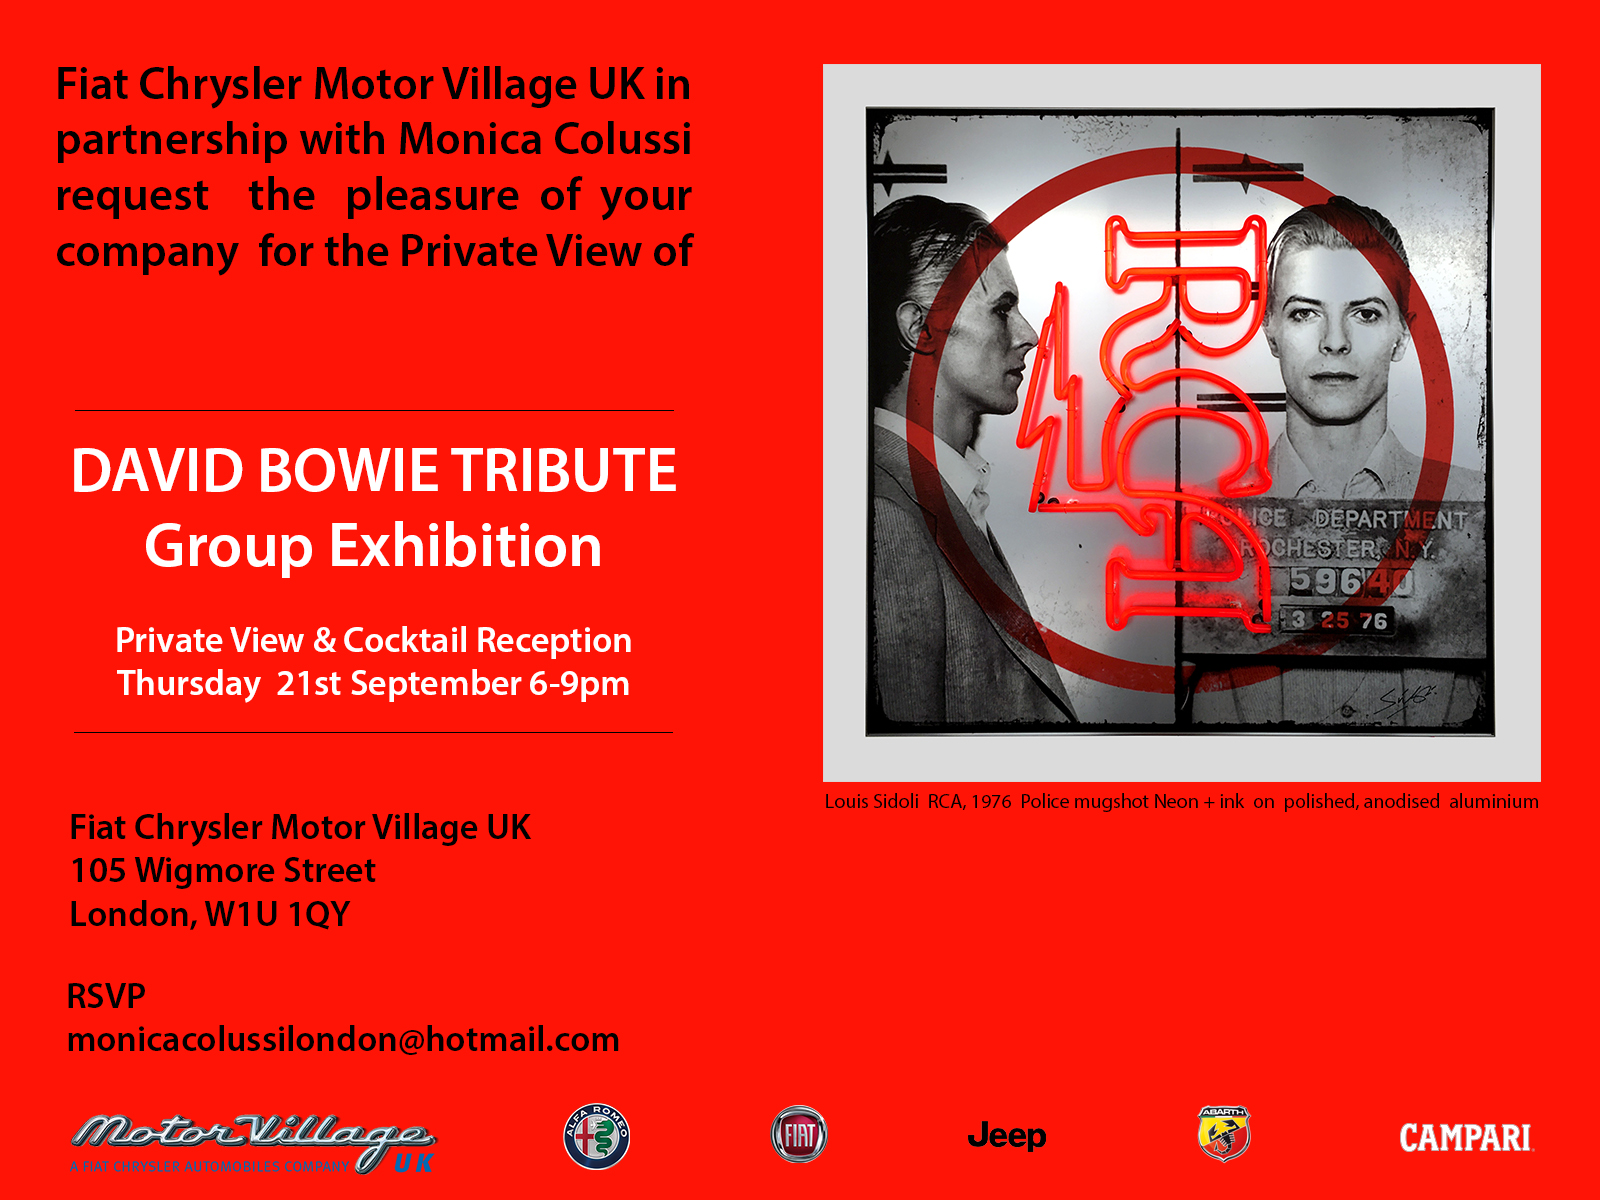 Louis Sidoli Neon Art - David Bowie tribute Art Exhibition